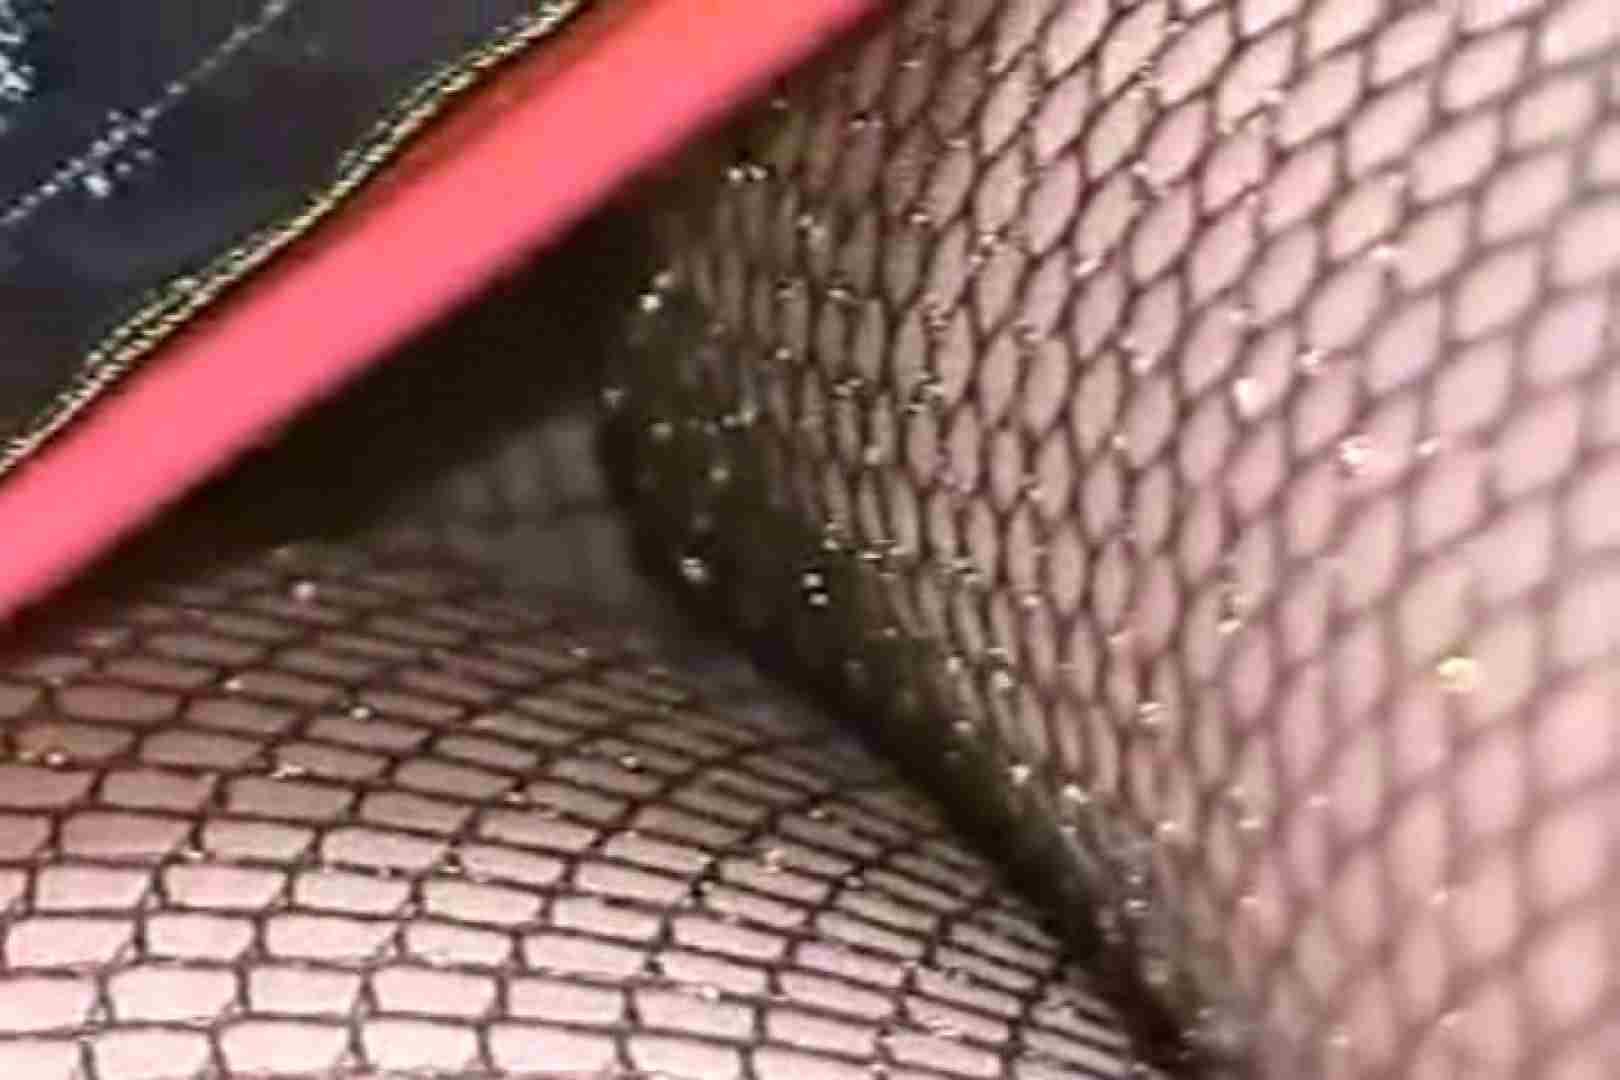 RQカメラ地獄Vol.20 美しいOLの裸体  98pic 8